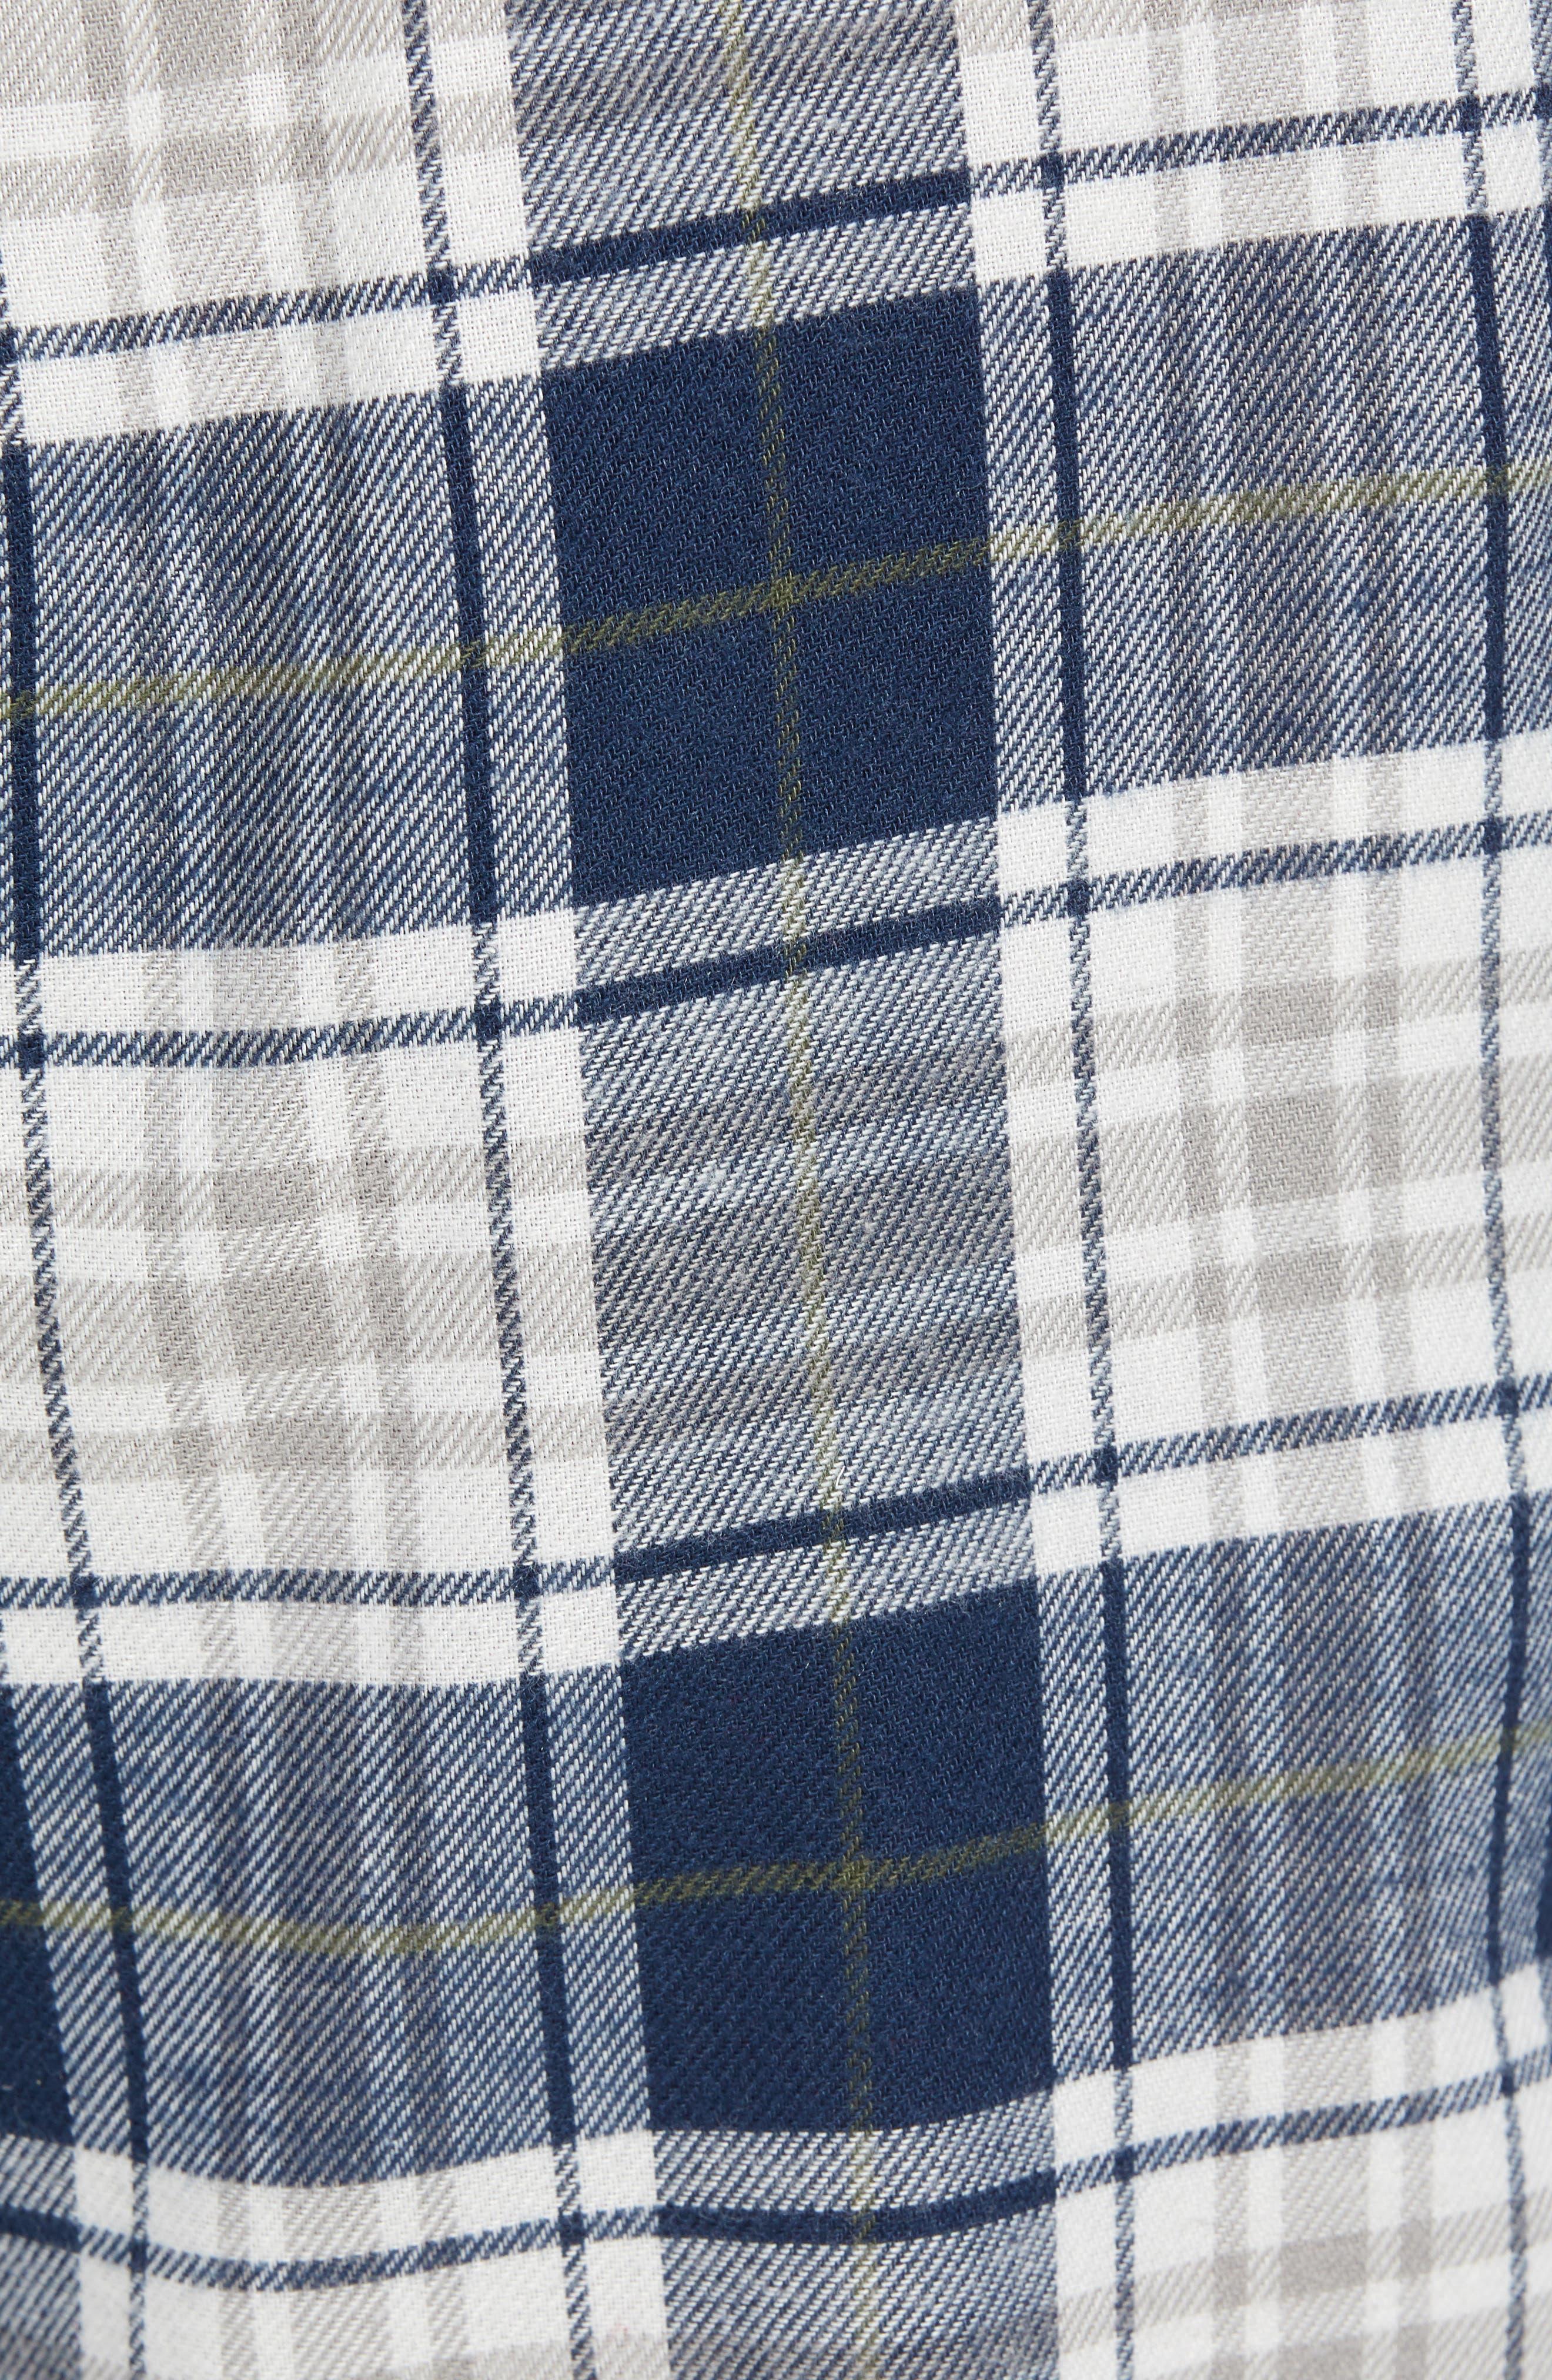 Steiner Pajama Set,                             Alternate thumbnail 5, color,                             NAVY/ GREY HEATHER